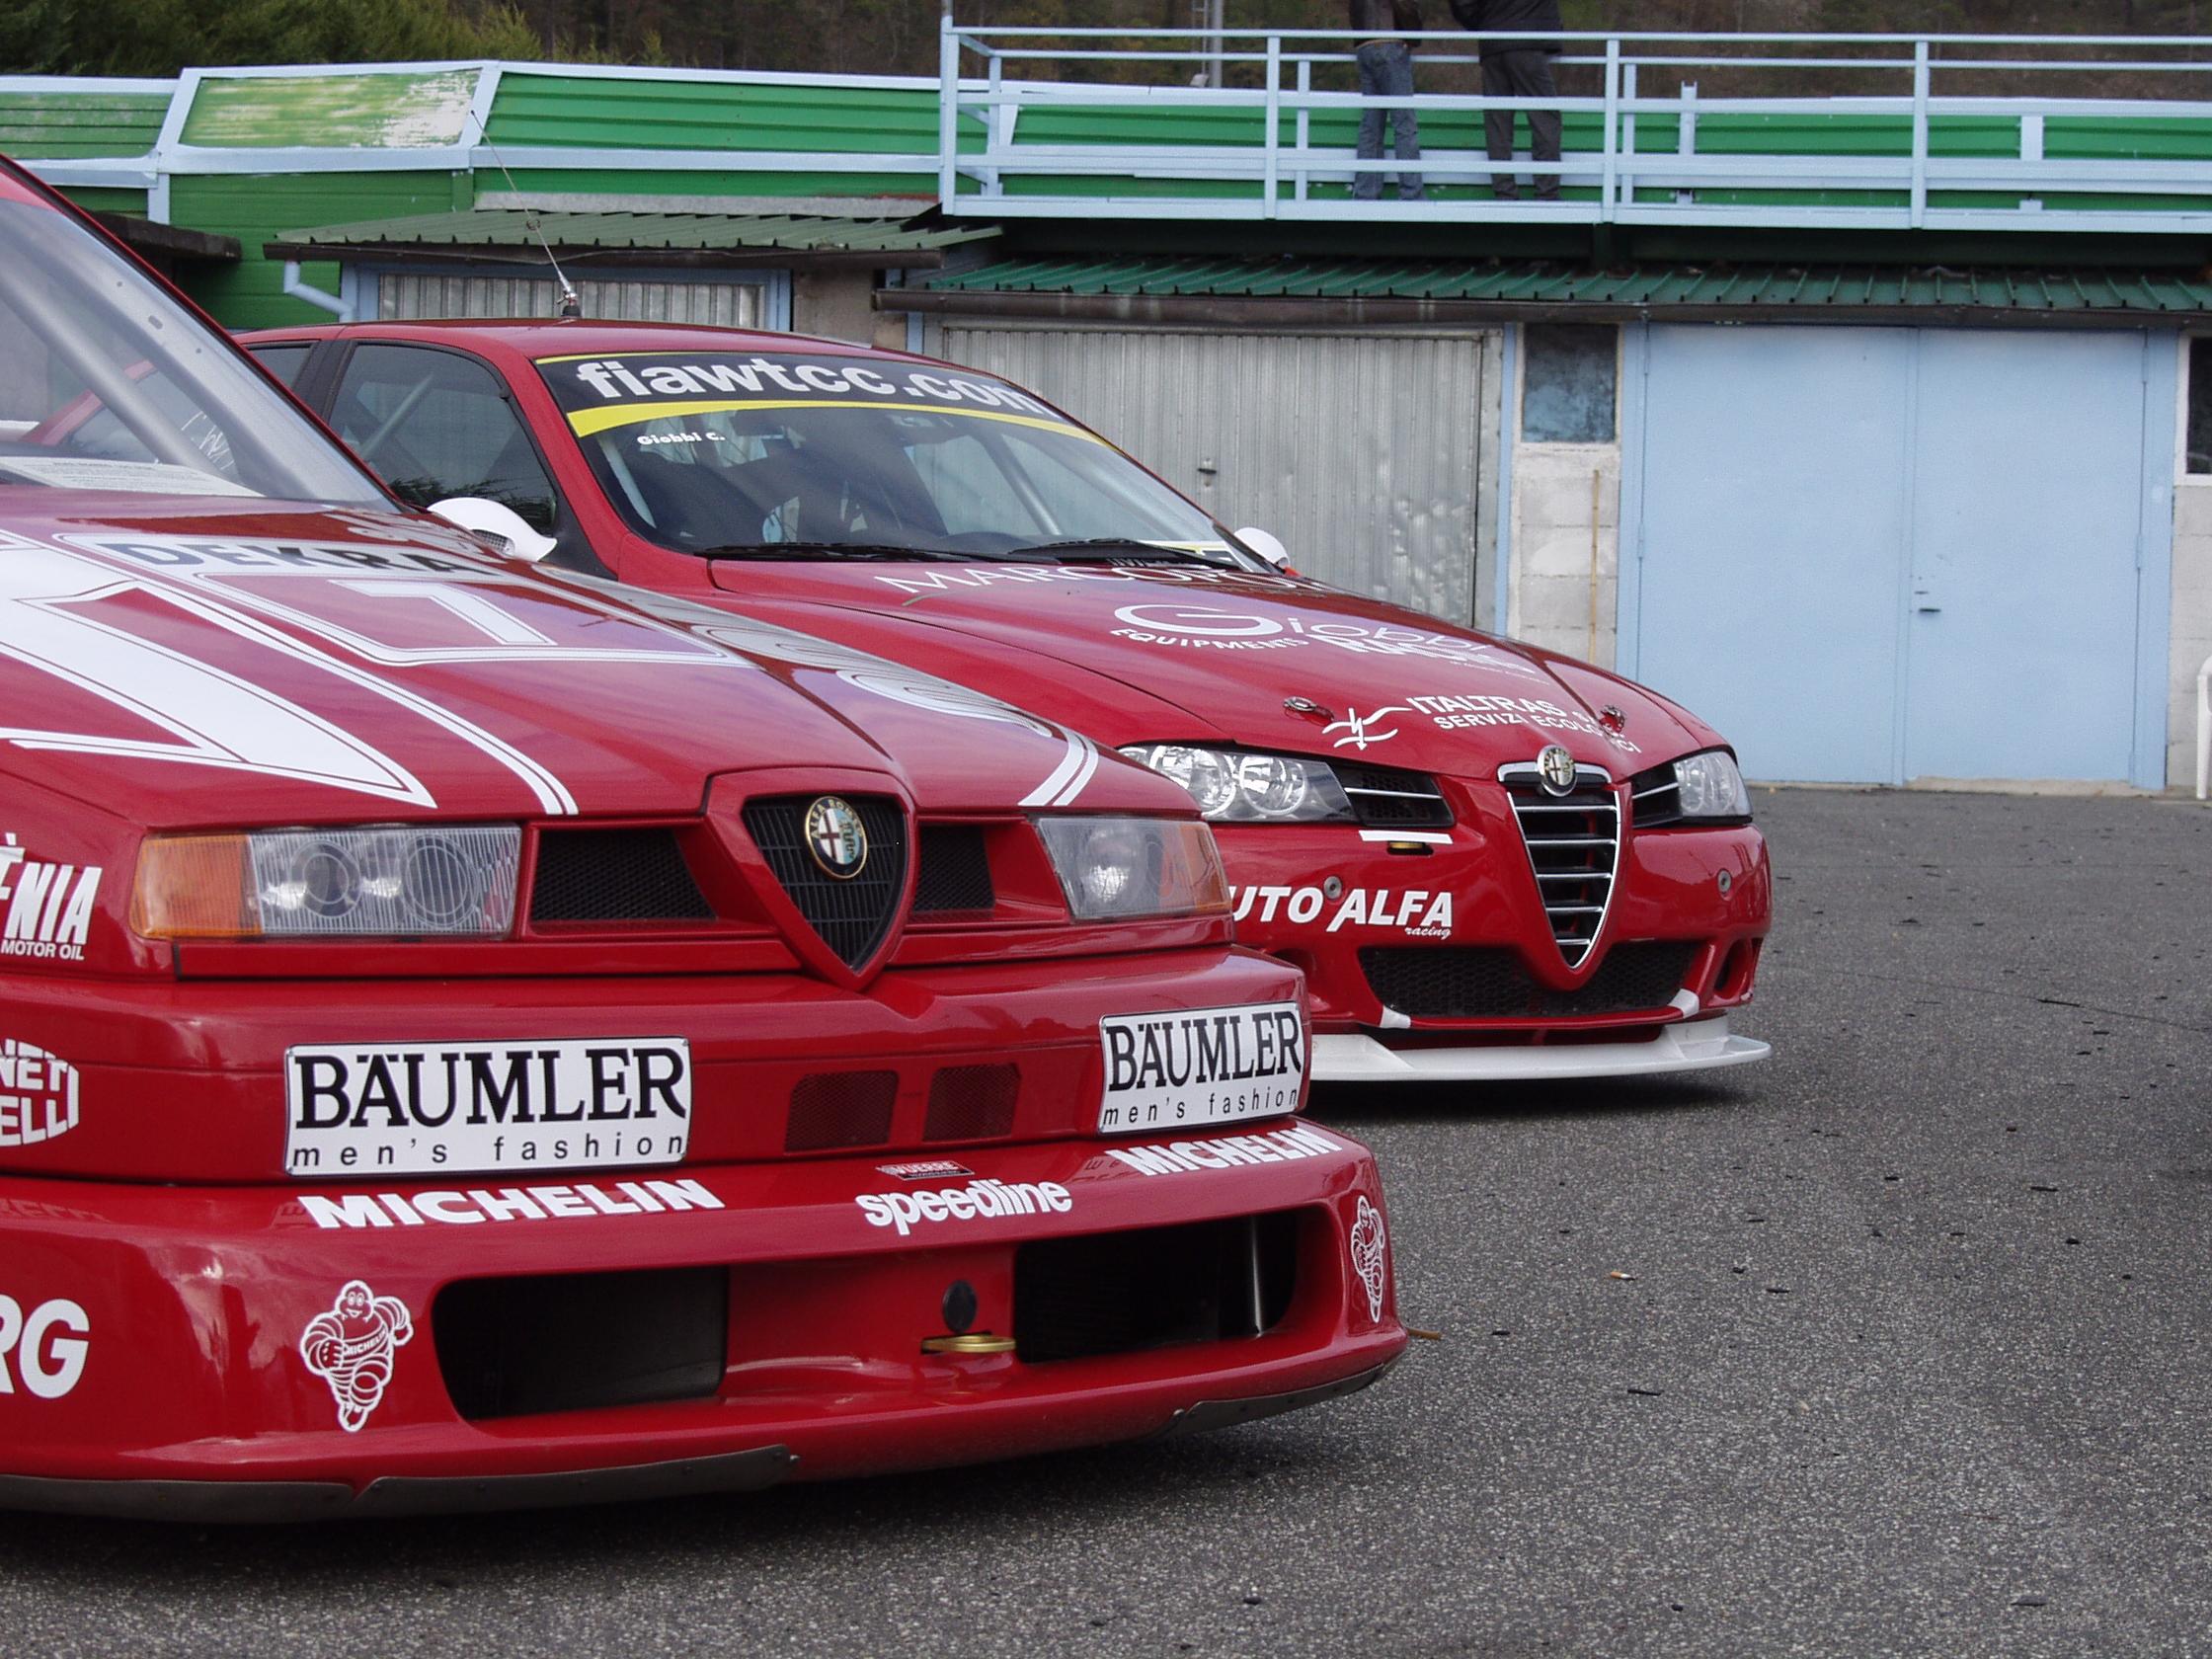 L' Alfa Romeo 155 V6 TI vista